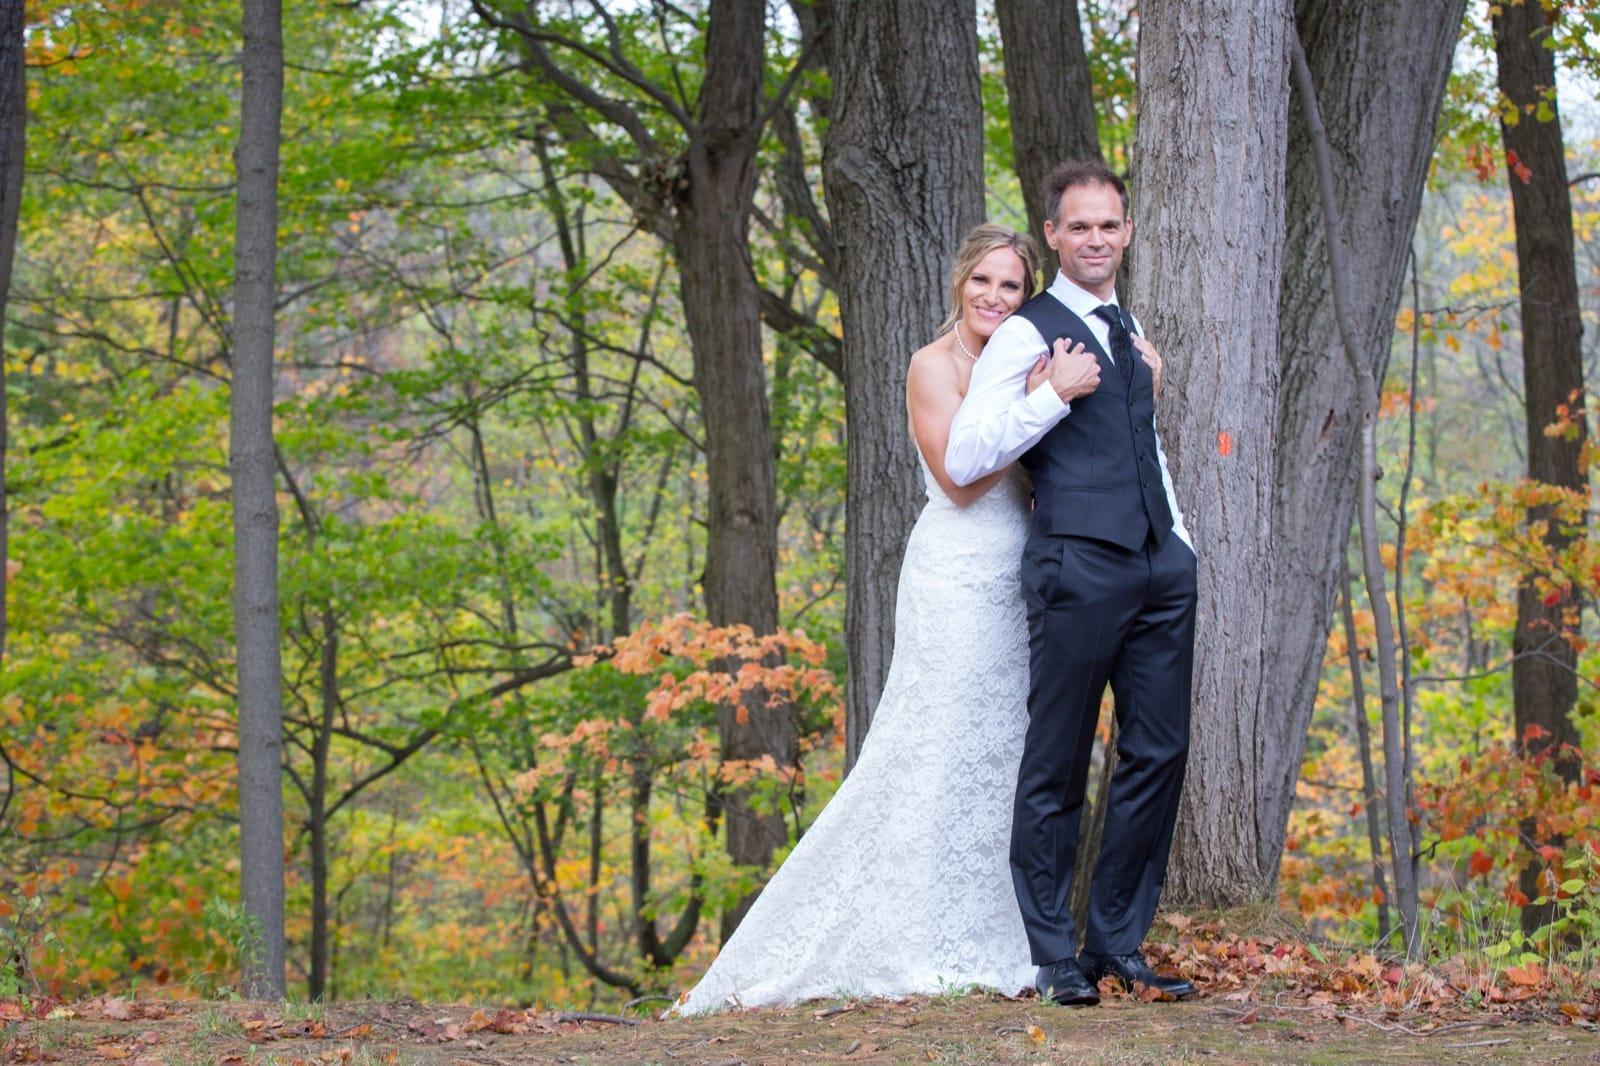 Mississauga wedding photography - Melanie and Chris